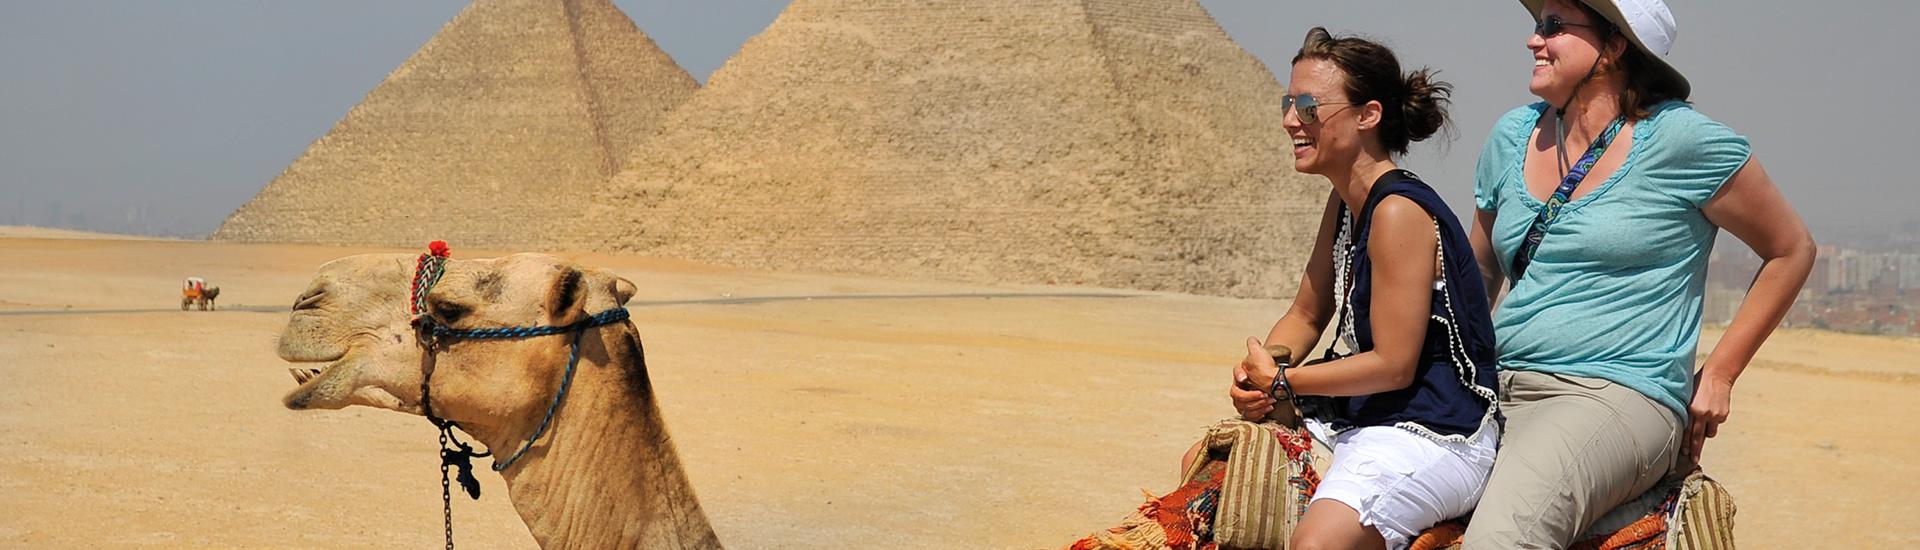 A sculpture in Egypt, near Luxor